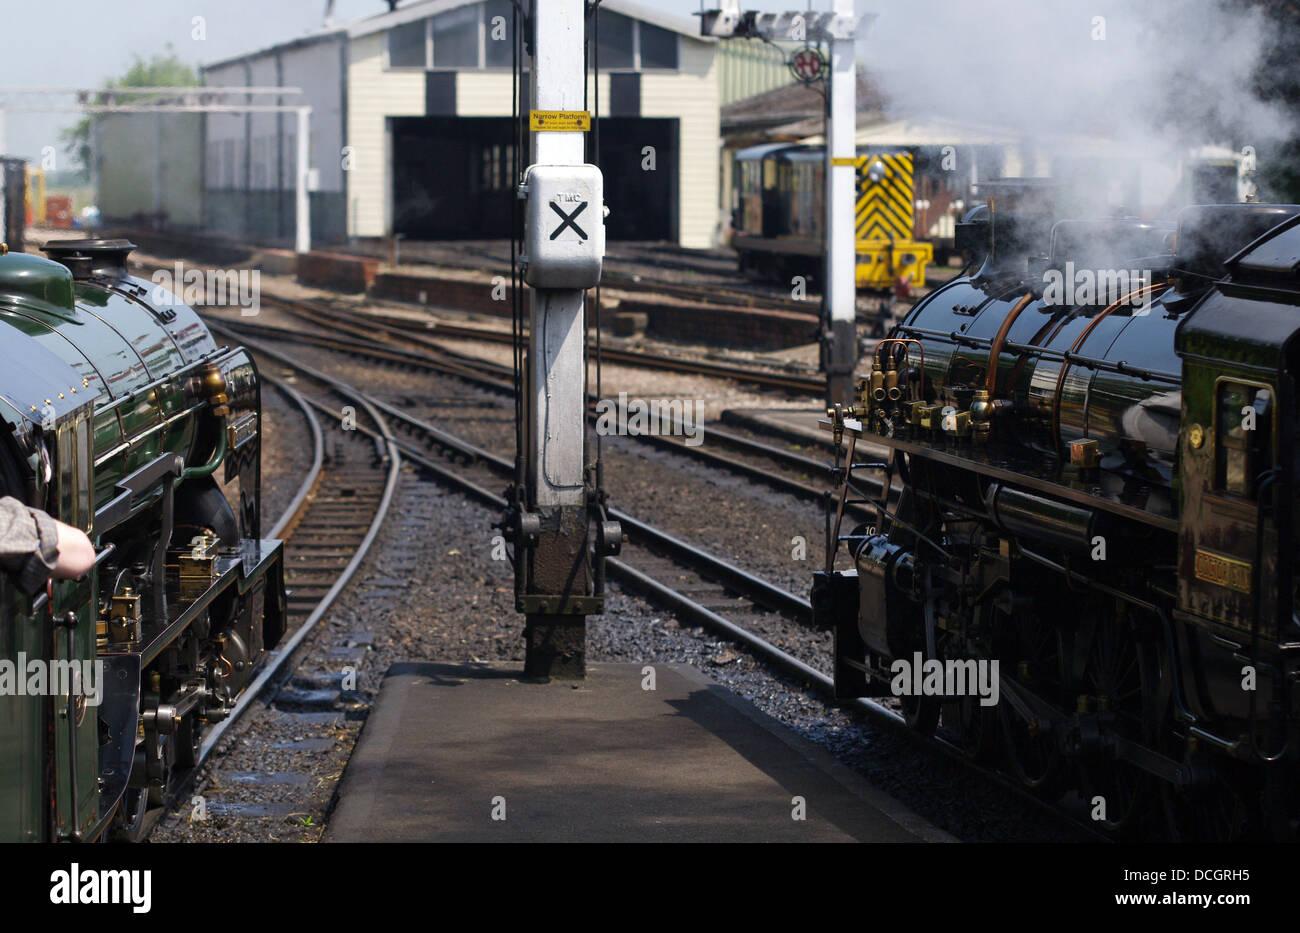 Romney, Hythe and Dymchurch Railway - New Romney station: Kent, England - Stock Image